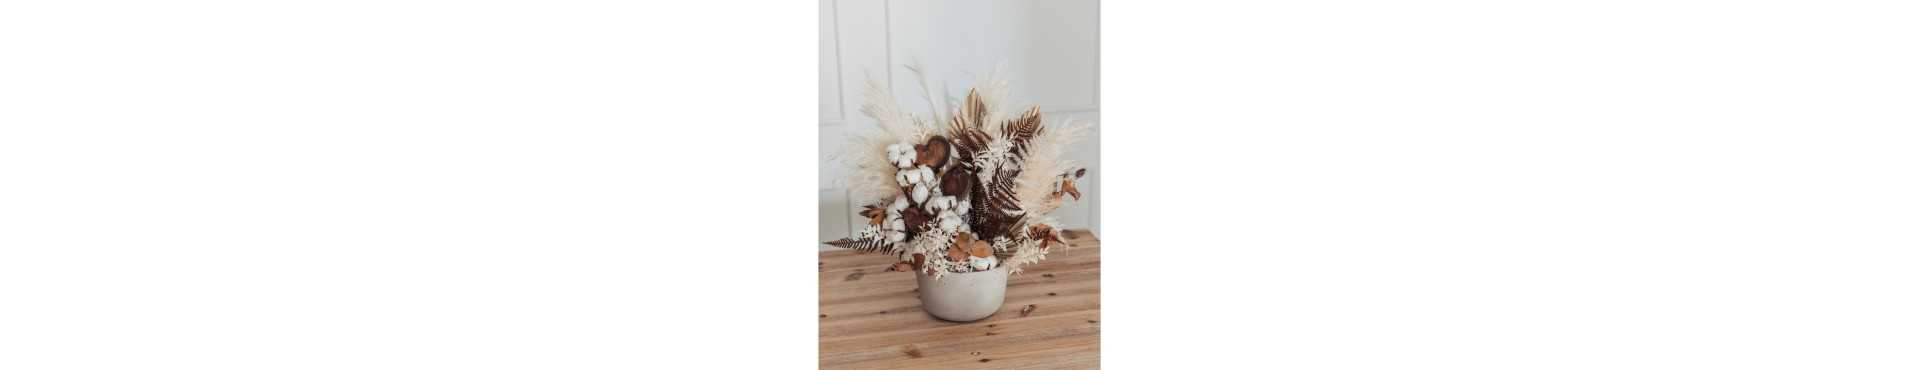 ▷ Comprar centros de flores secas online | Bahay BCN